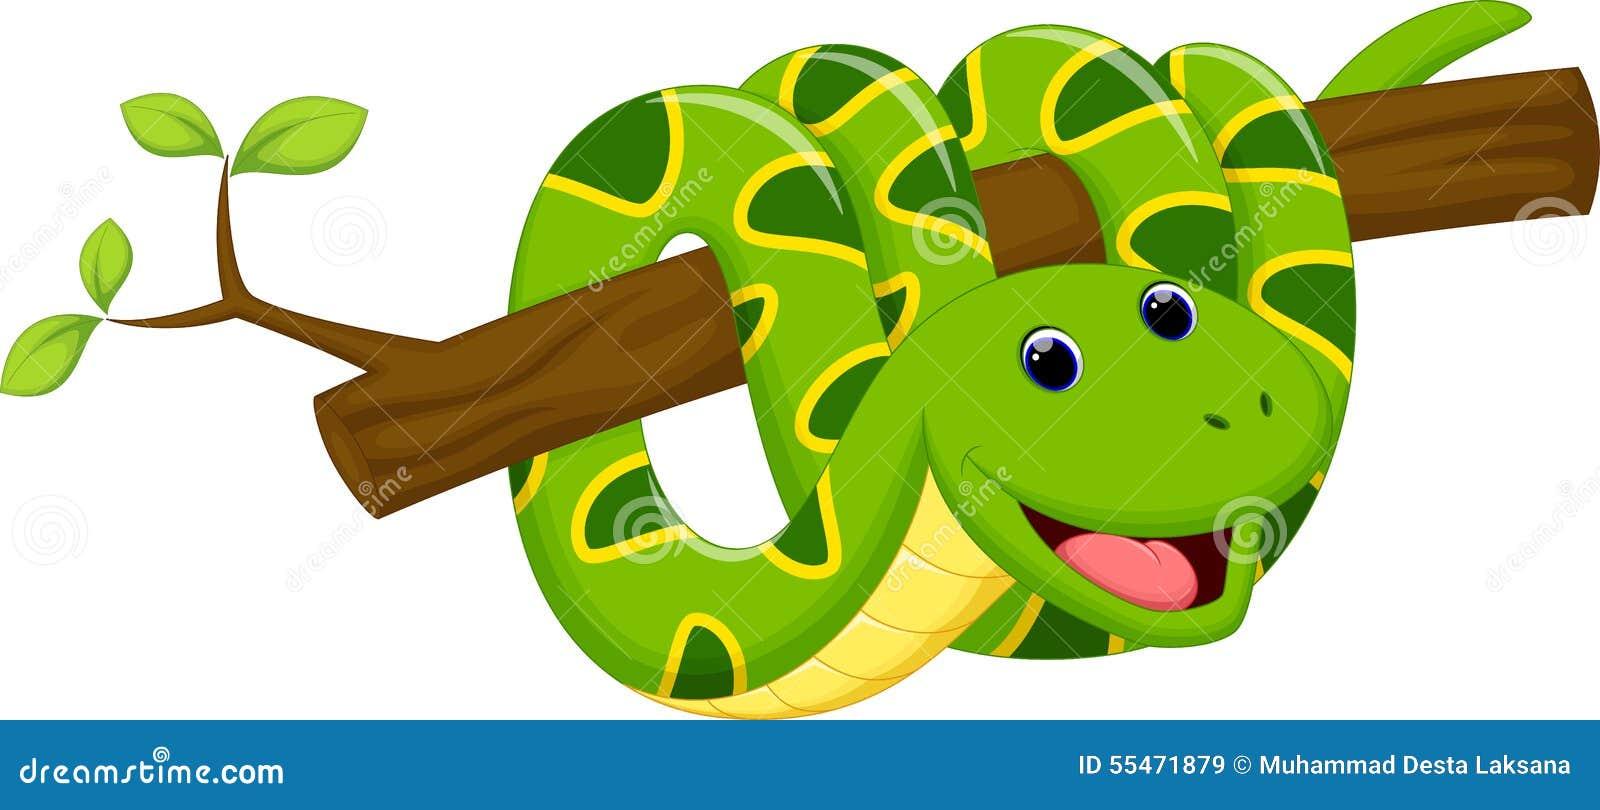 Green snake cartoon royalty free stock image image 19462406 - Cute Snake Cartoon Royalty Free Stock Images